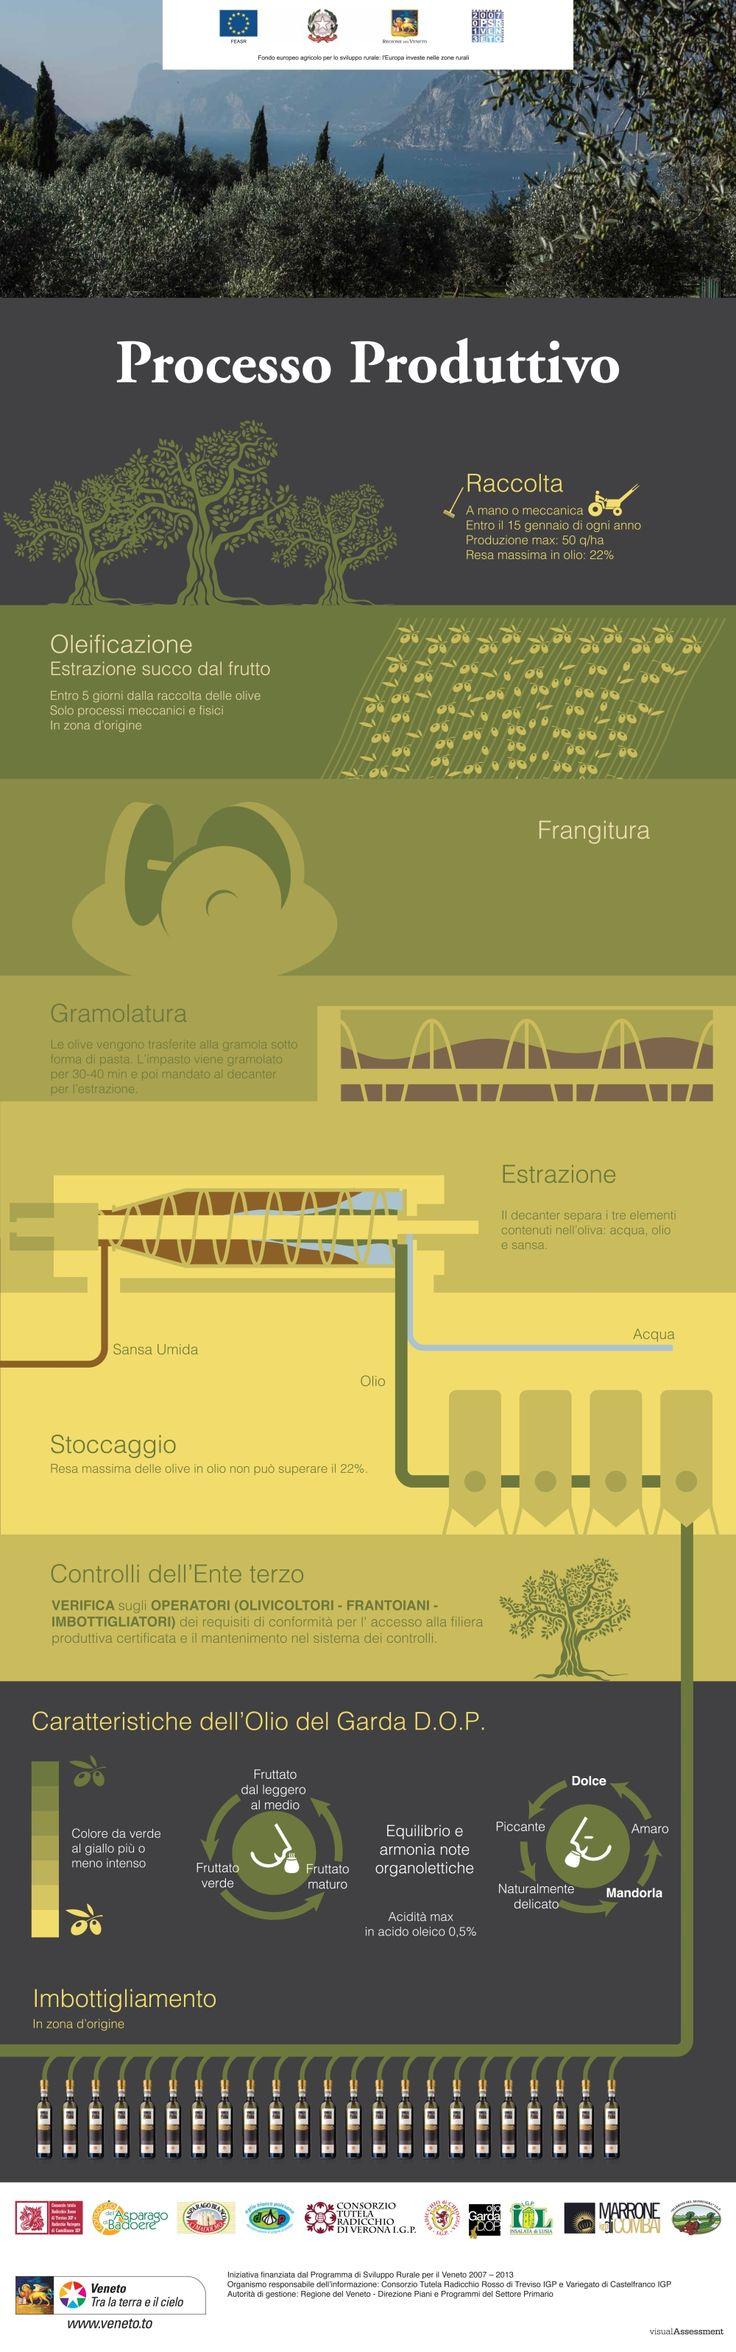 olio garda infografica 4